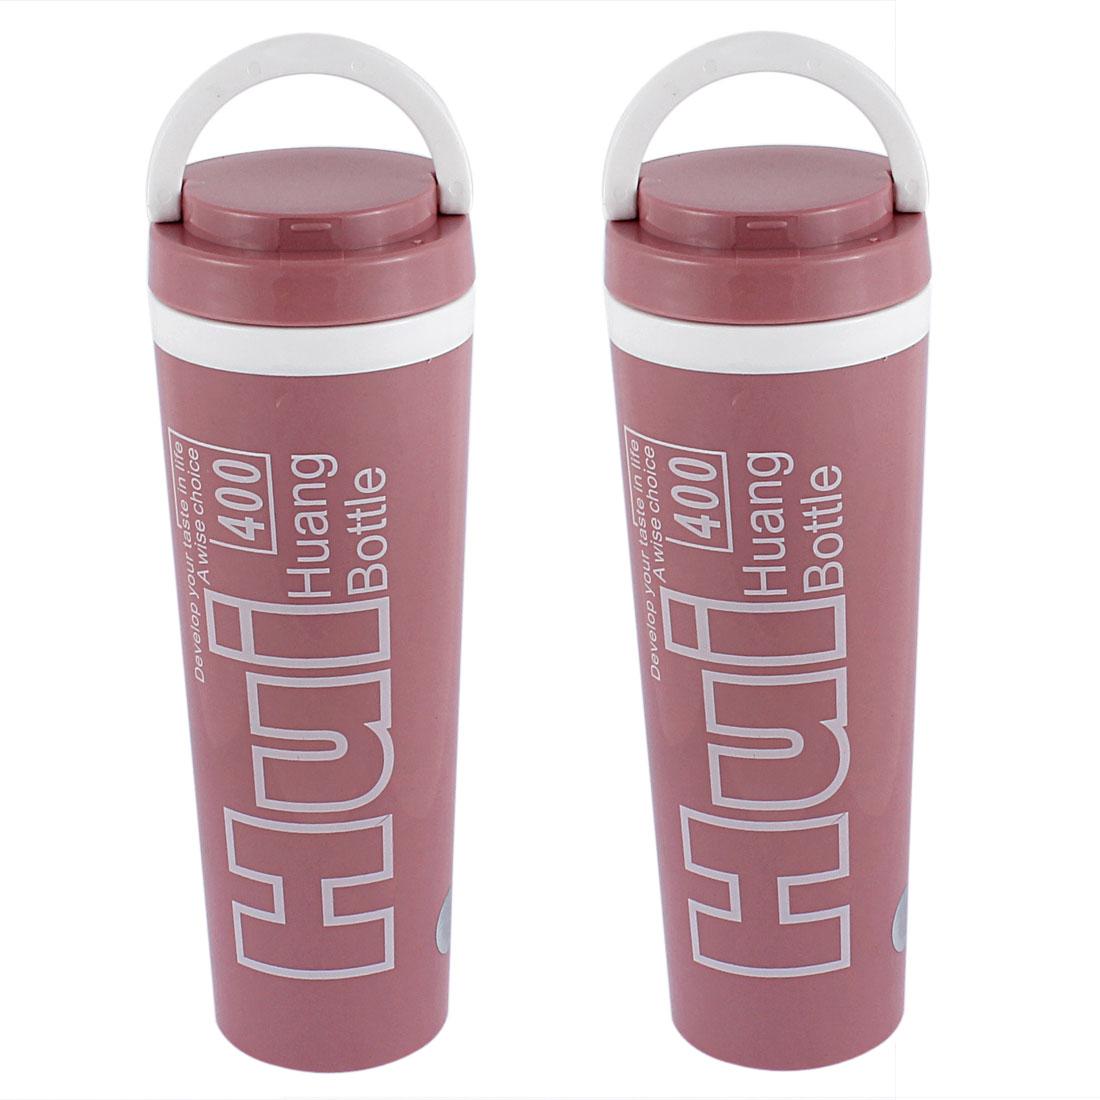 Plastic Insulated Heat Retaining Water Bottle Mug Vacuum Flask 400ml Light Pink 2pcs